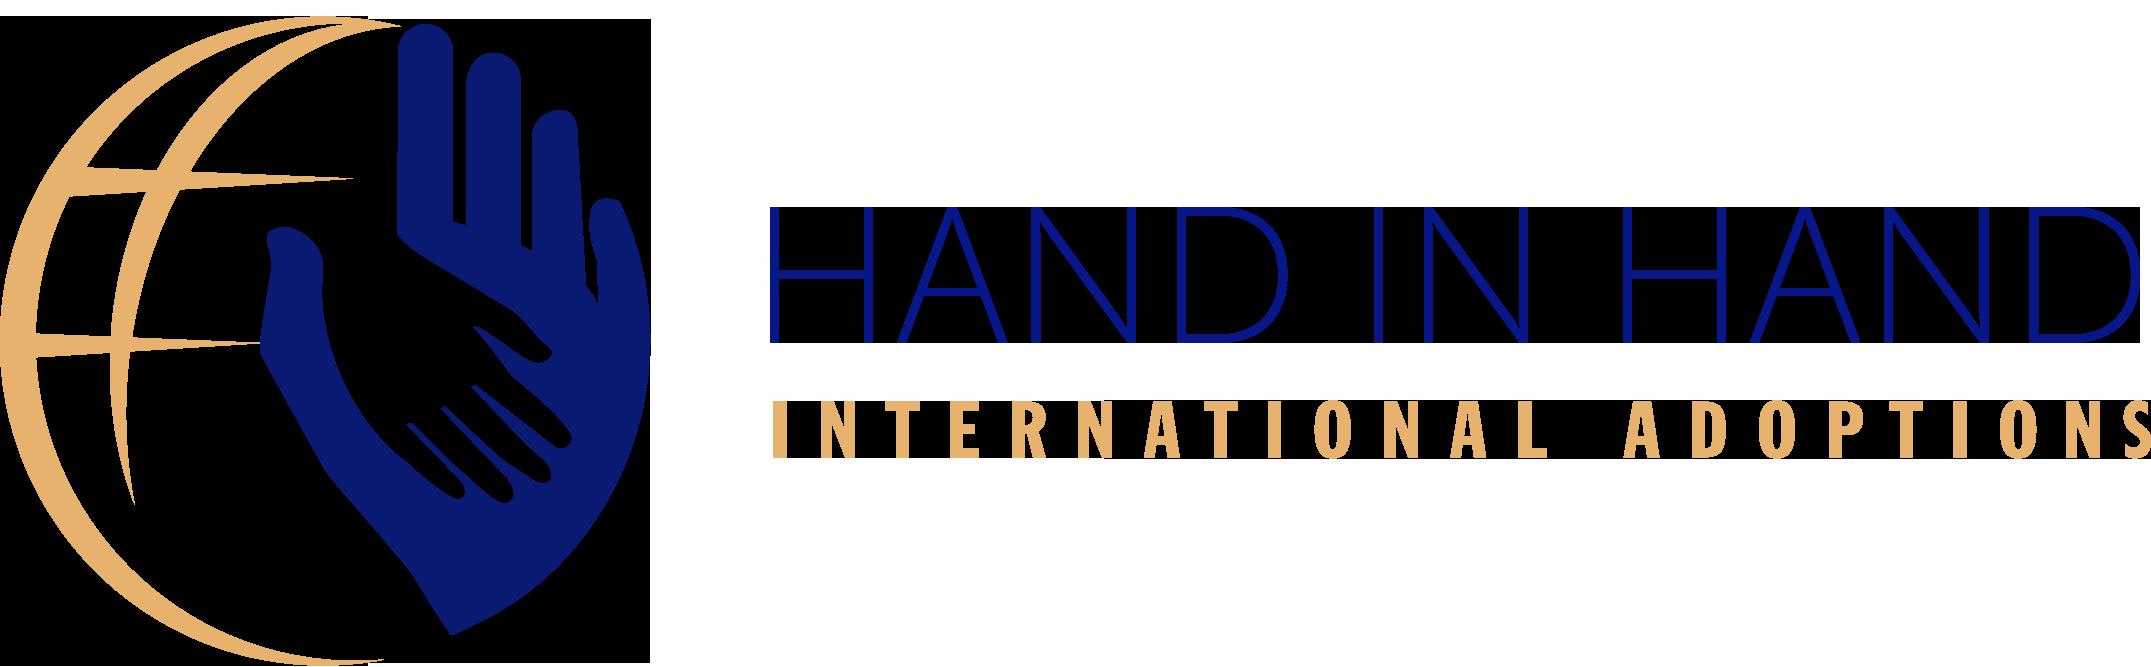 Hand In Hand International Adoptions